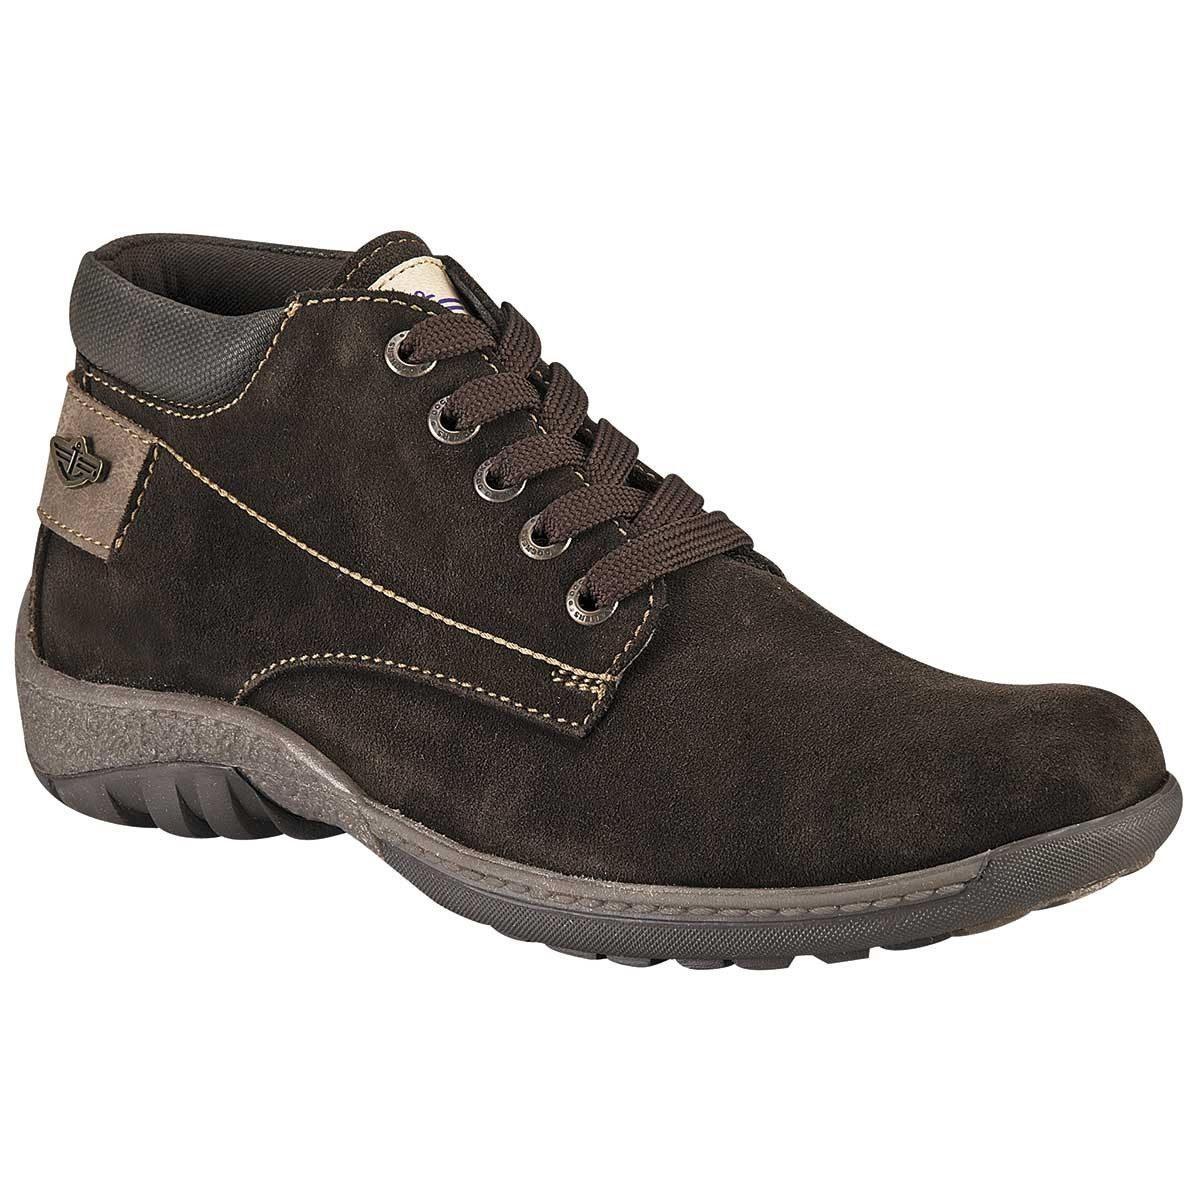 10cee718bab zapato tipo bota dockers para hombre. Cargando zoom.